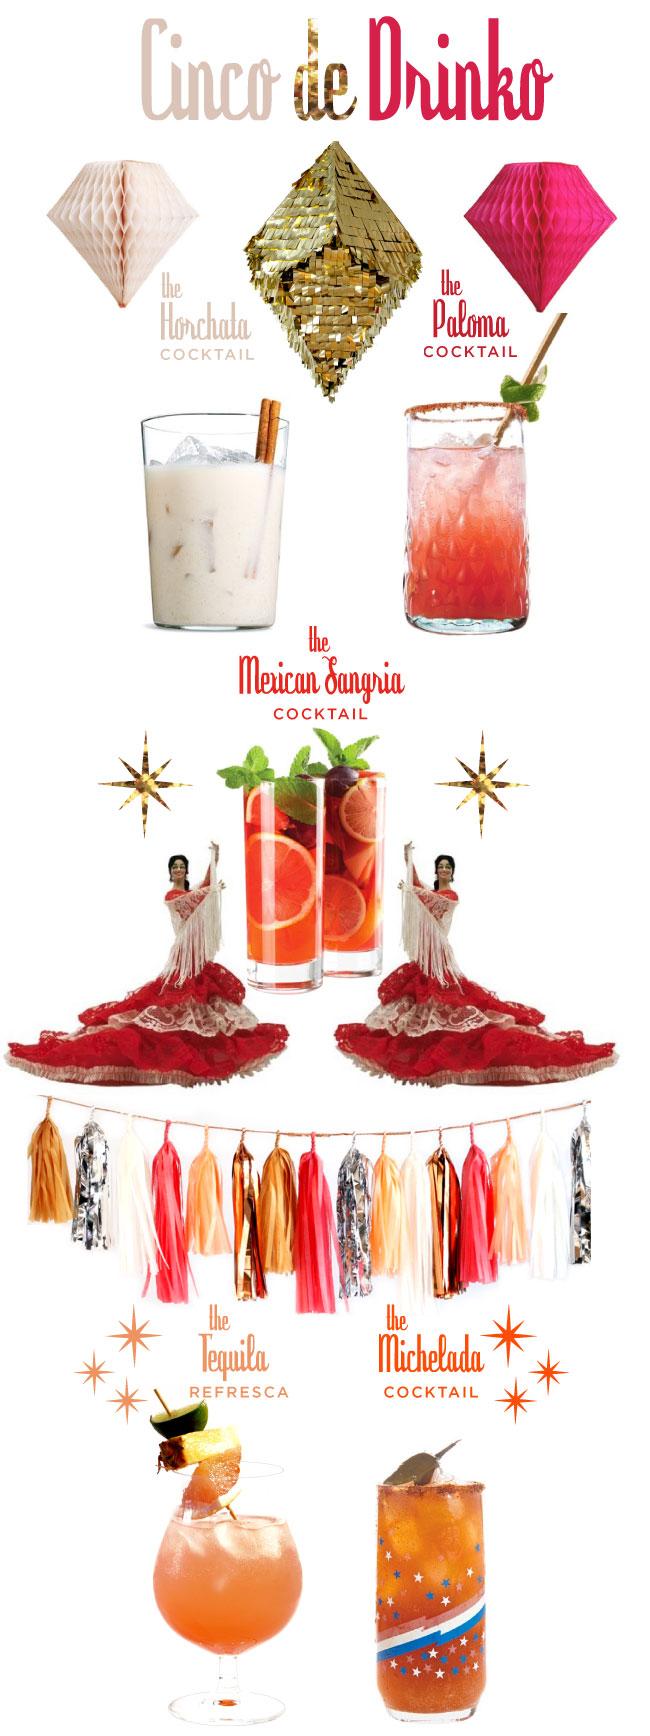 Sangria clipart mexican Cocktail cocktail paloma de paloma